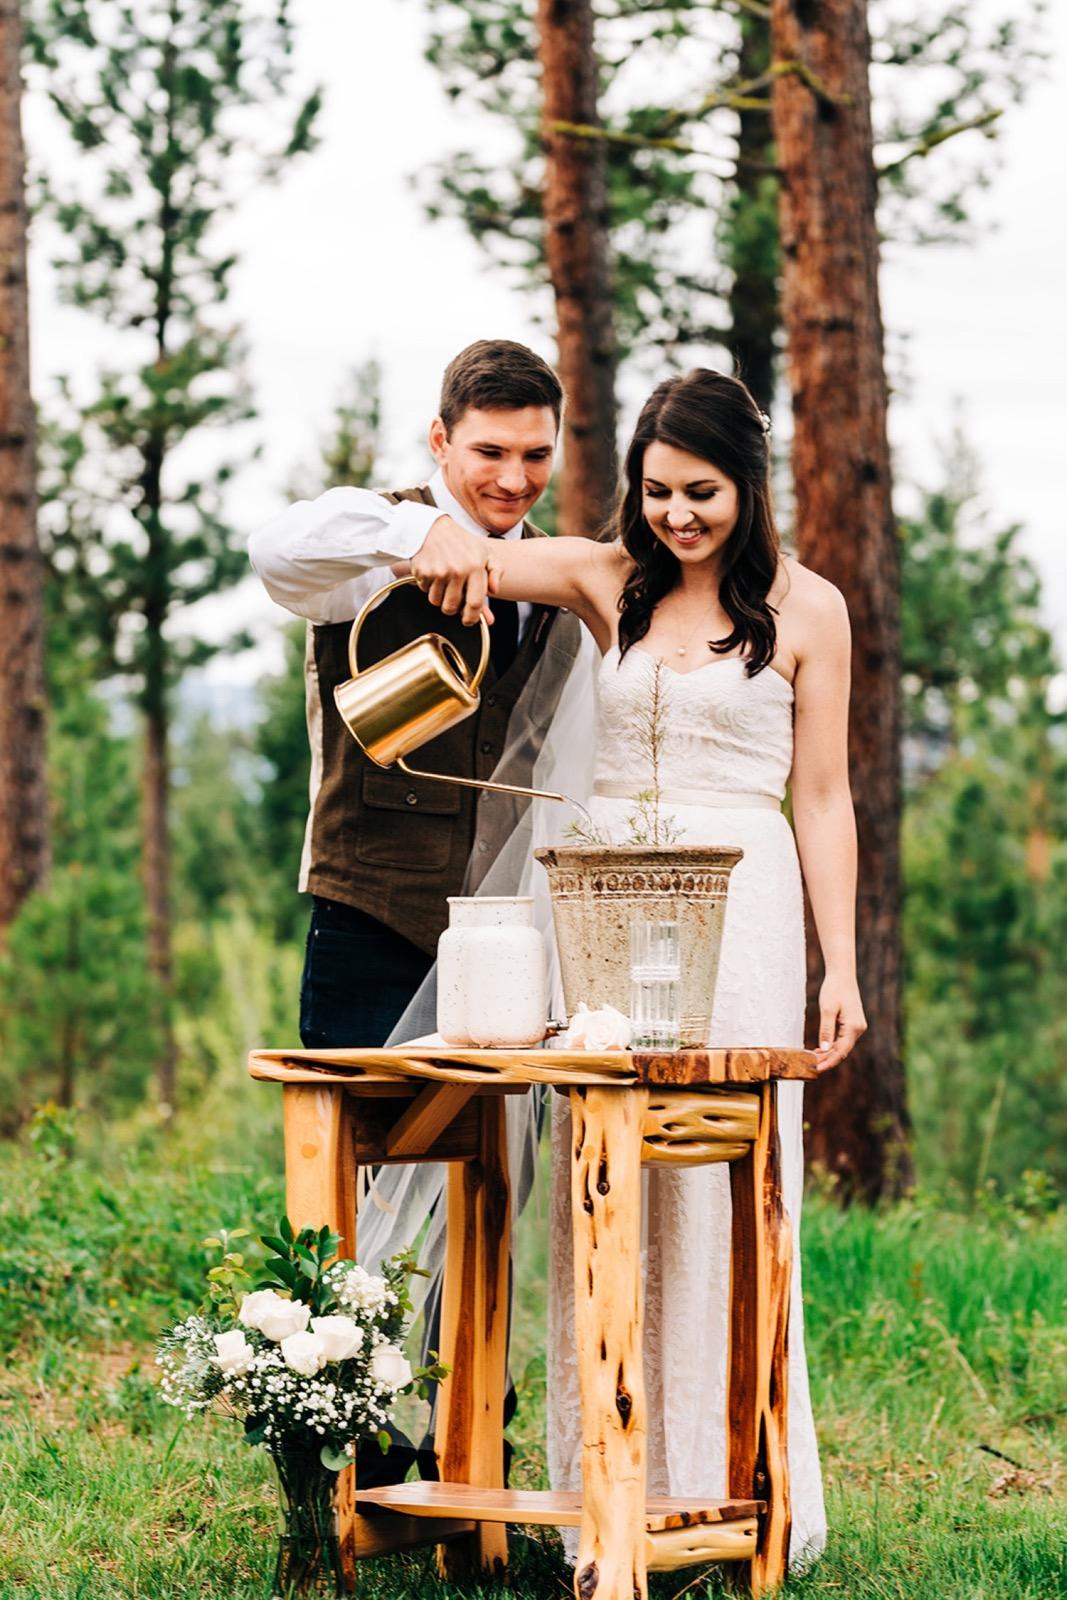 054_katie_chris_wedding-117.jpg